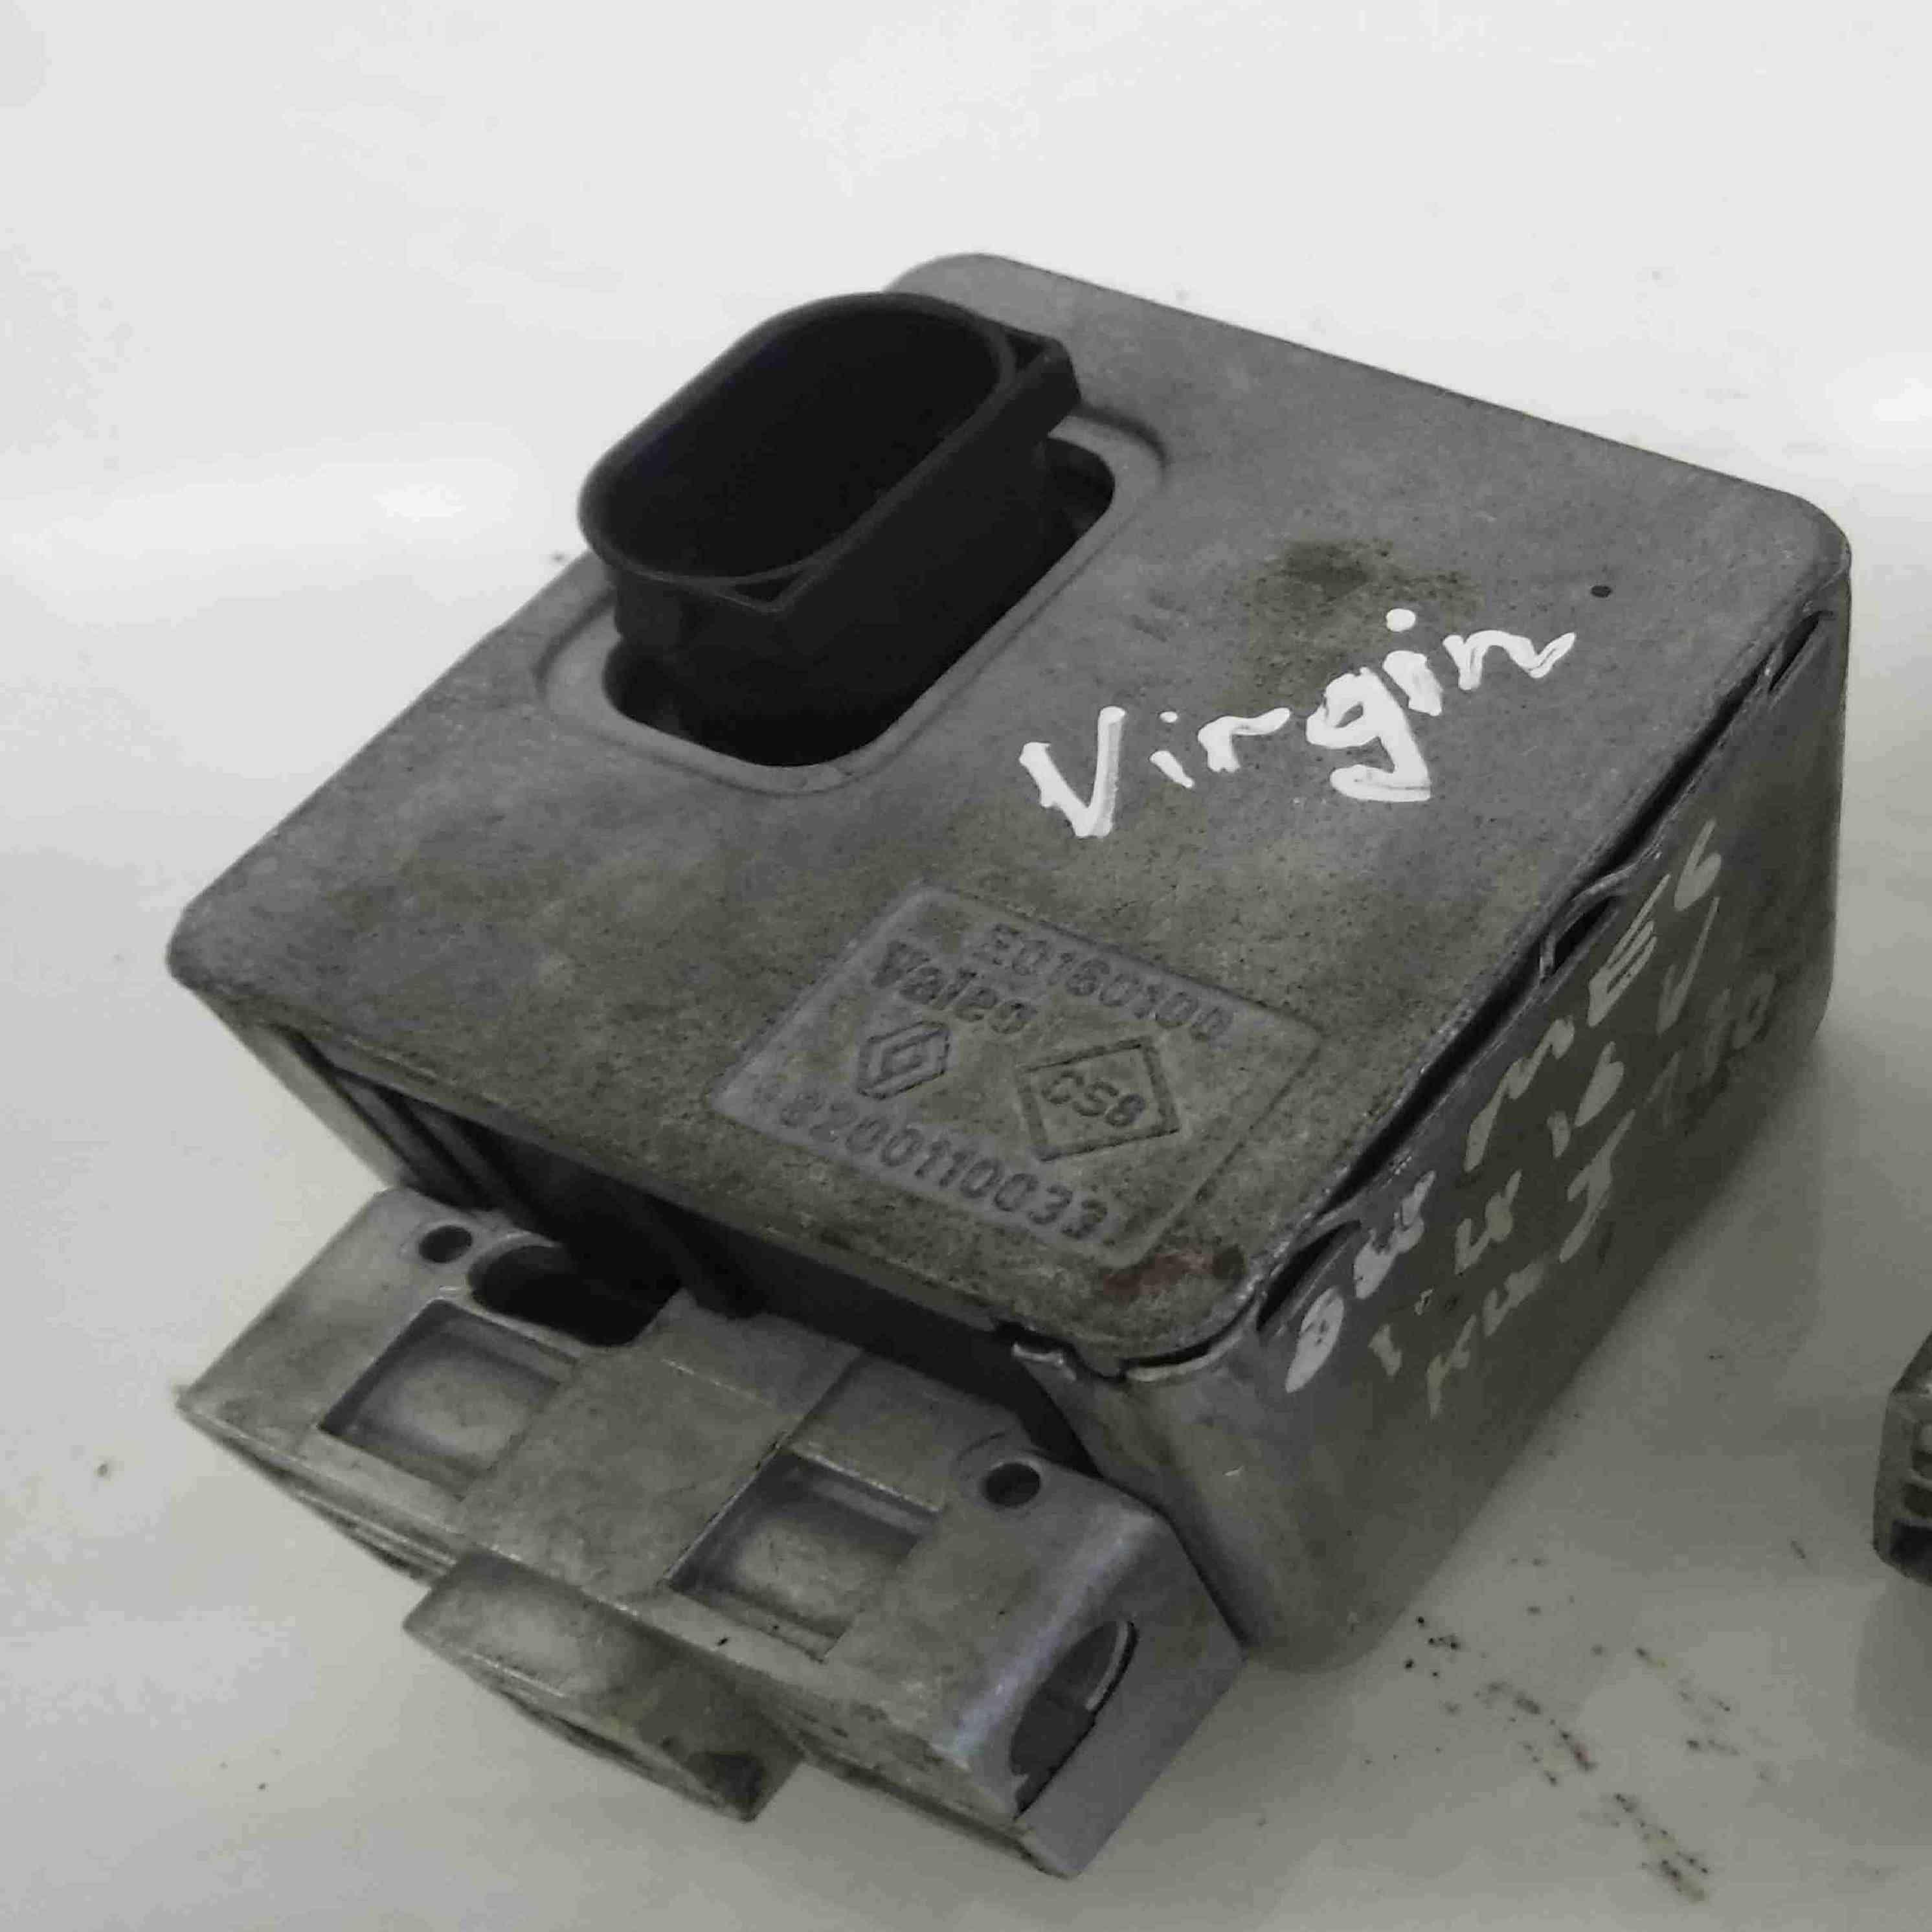 Renault Megane + Scenic 2003-2009 Steering Column Lock Box Virginised DECODED